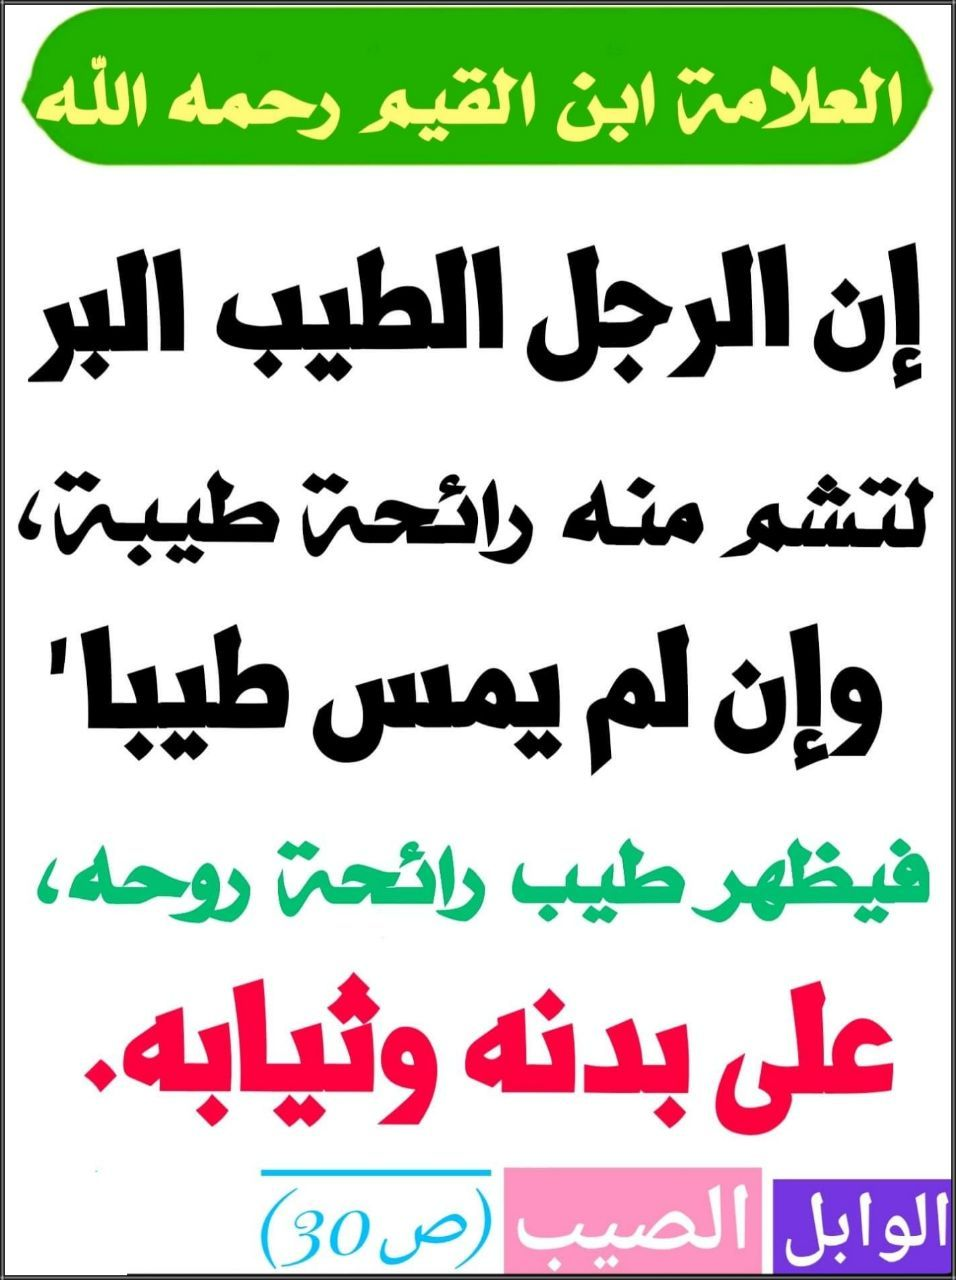 Pin By ابو عبده On أقوال الصحابة والعلماء Islam Facts Holy Quran Islam